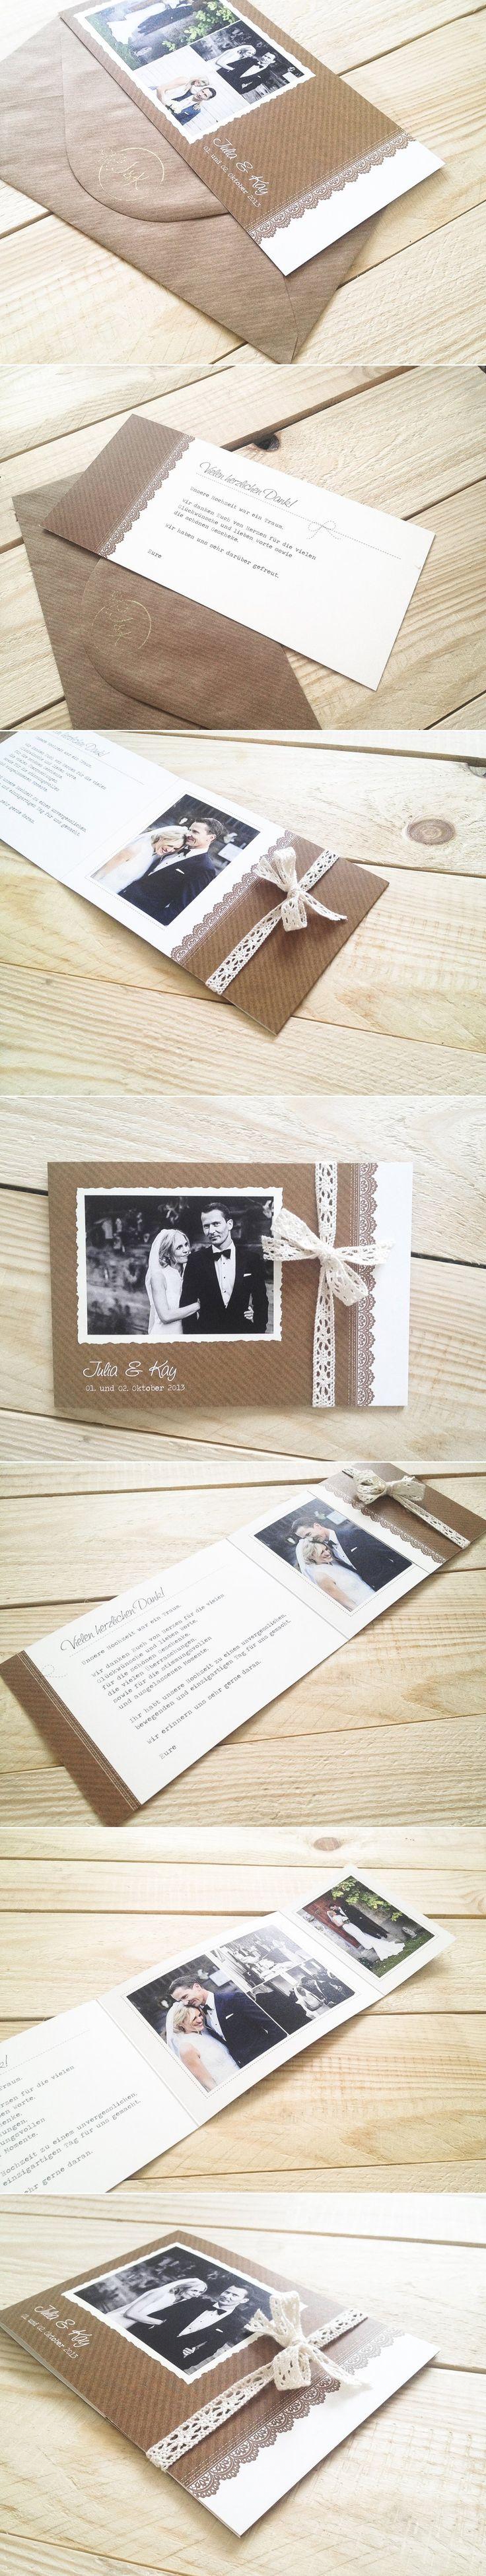 Danksagungskarten in Rustik Schick mit Fotolasche